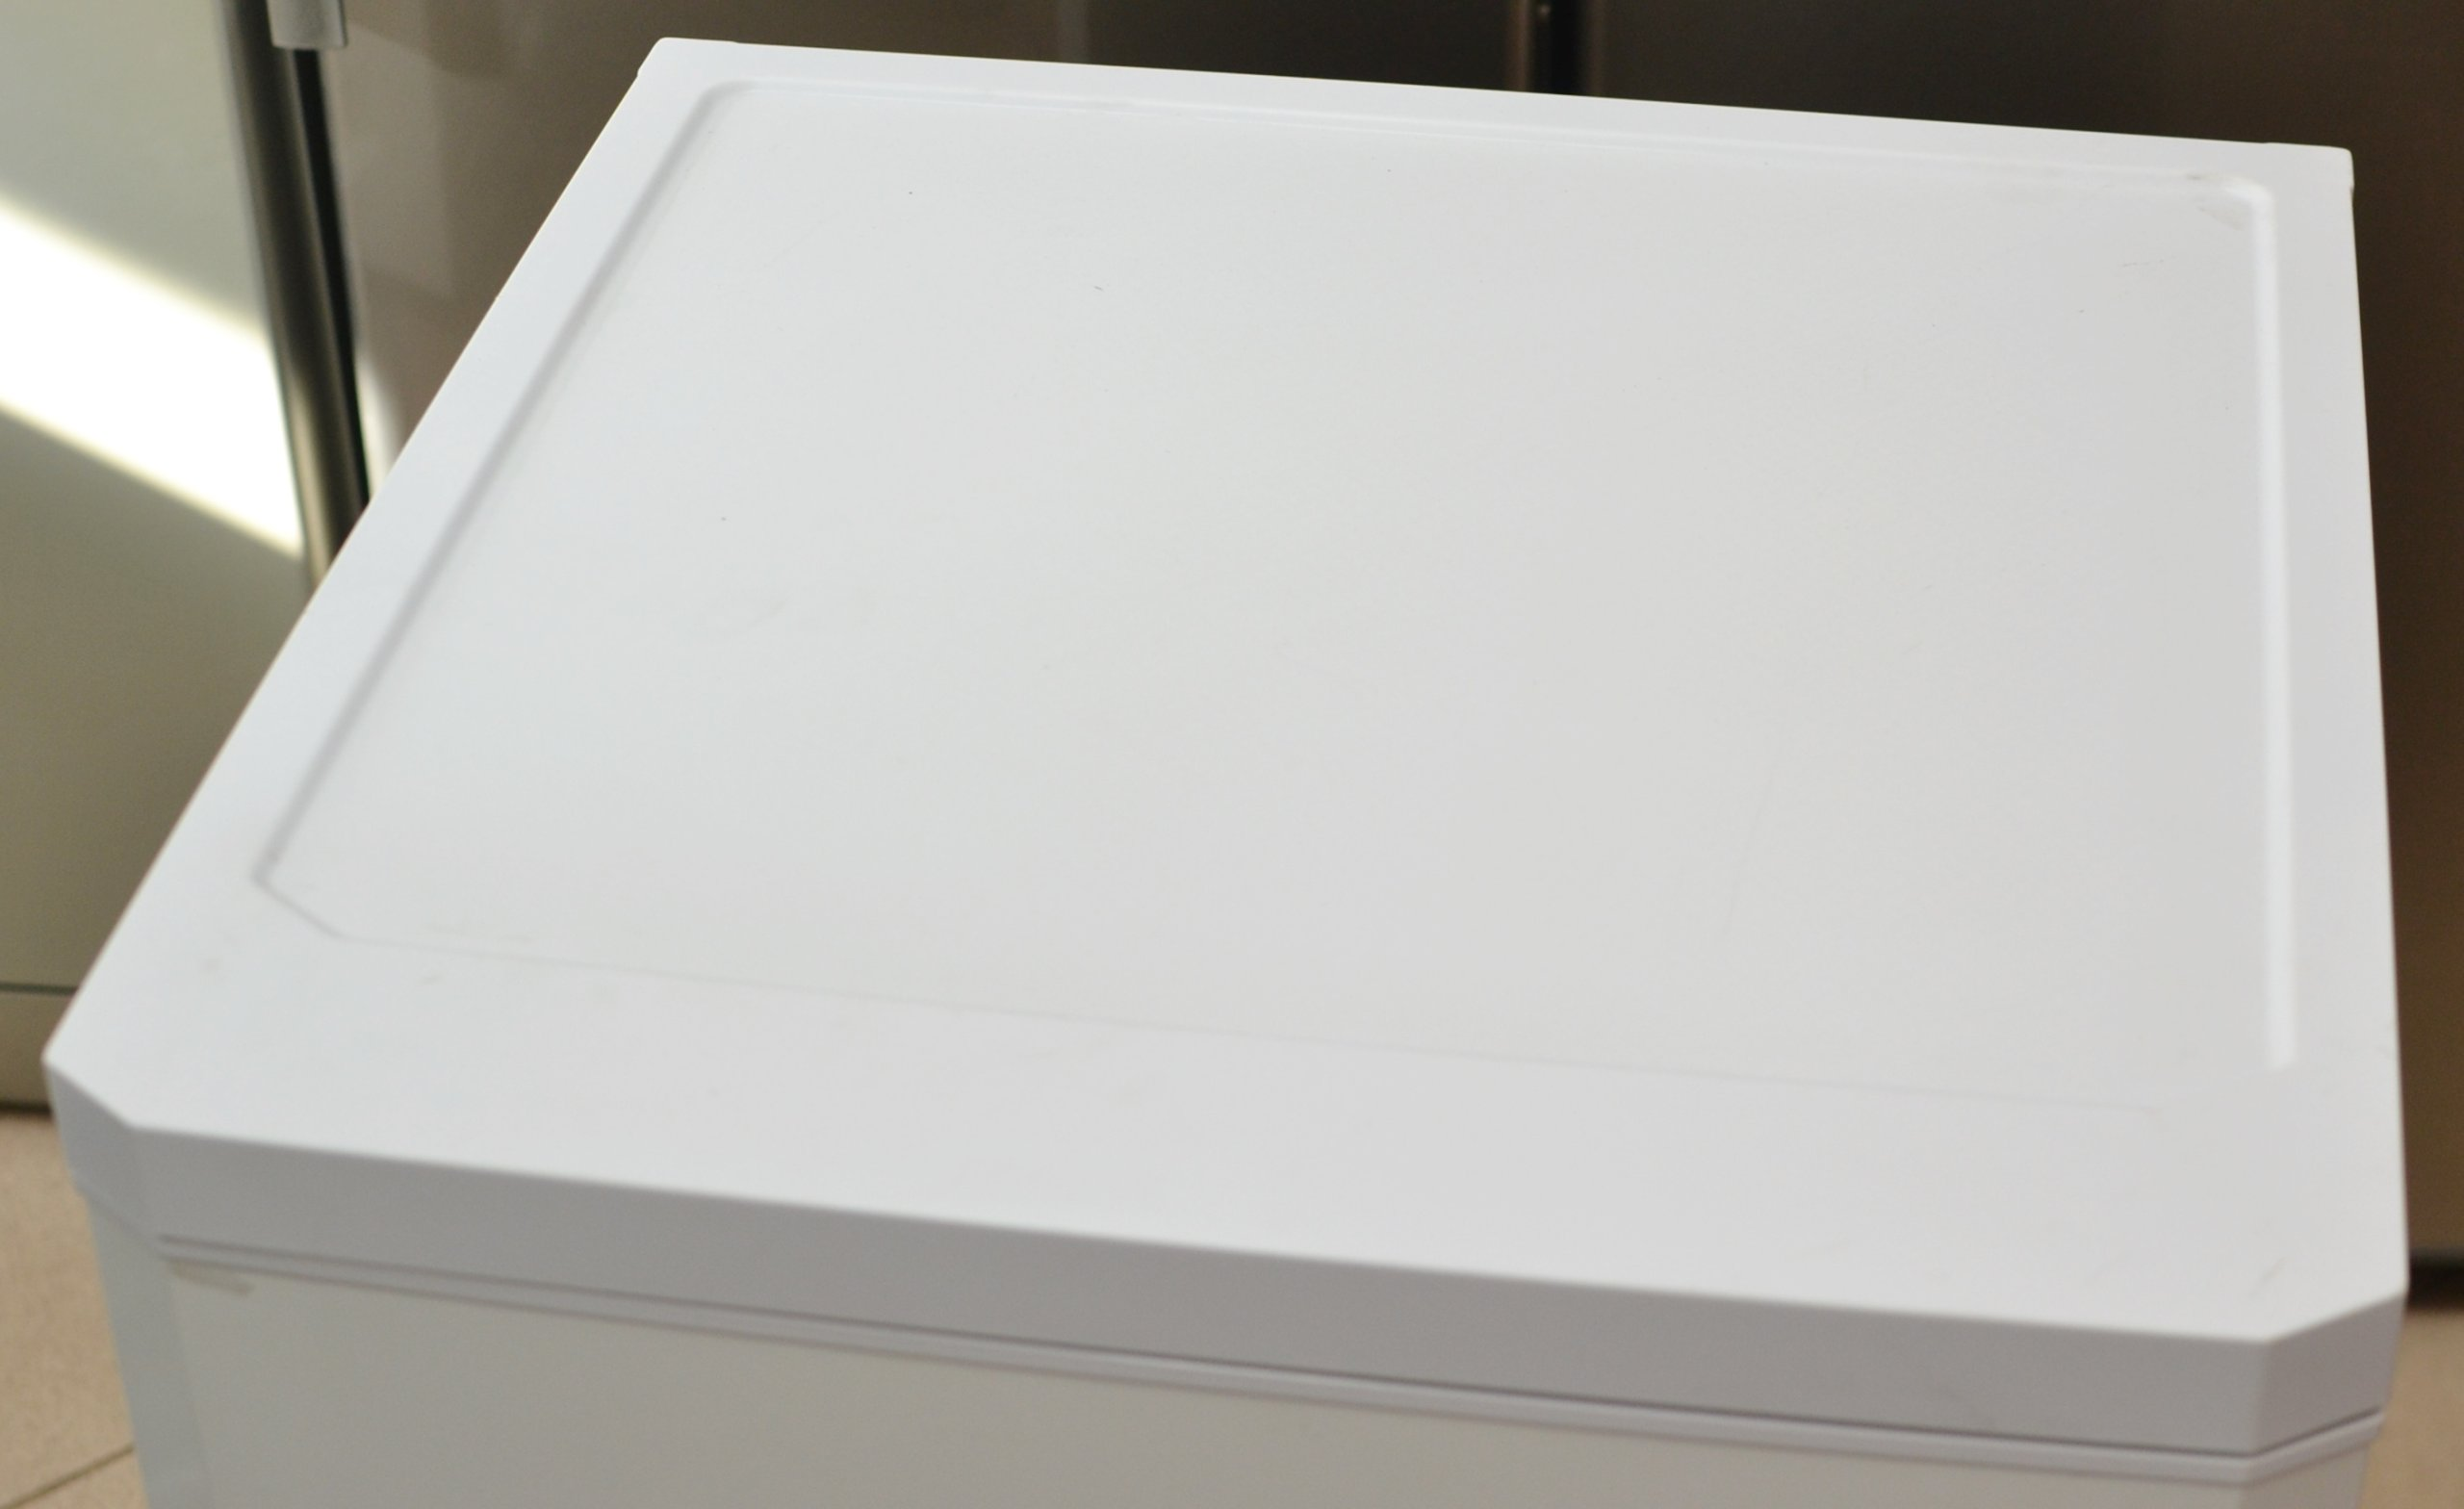 Amica Kühlschrank Ks 15123 W : Amica kühlschrank ks 15123 w: vollraum kühlschrank vksr 354 150 b